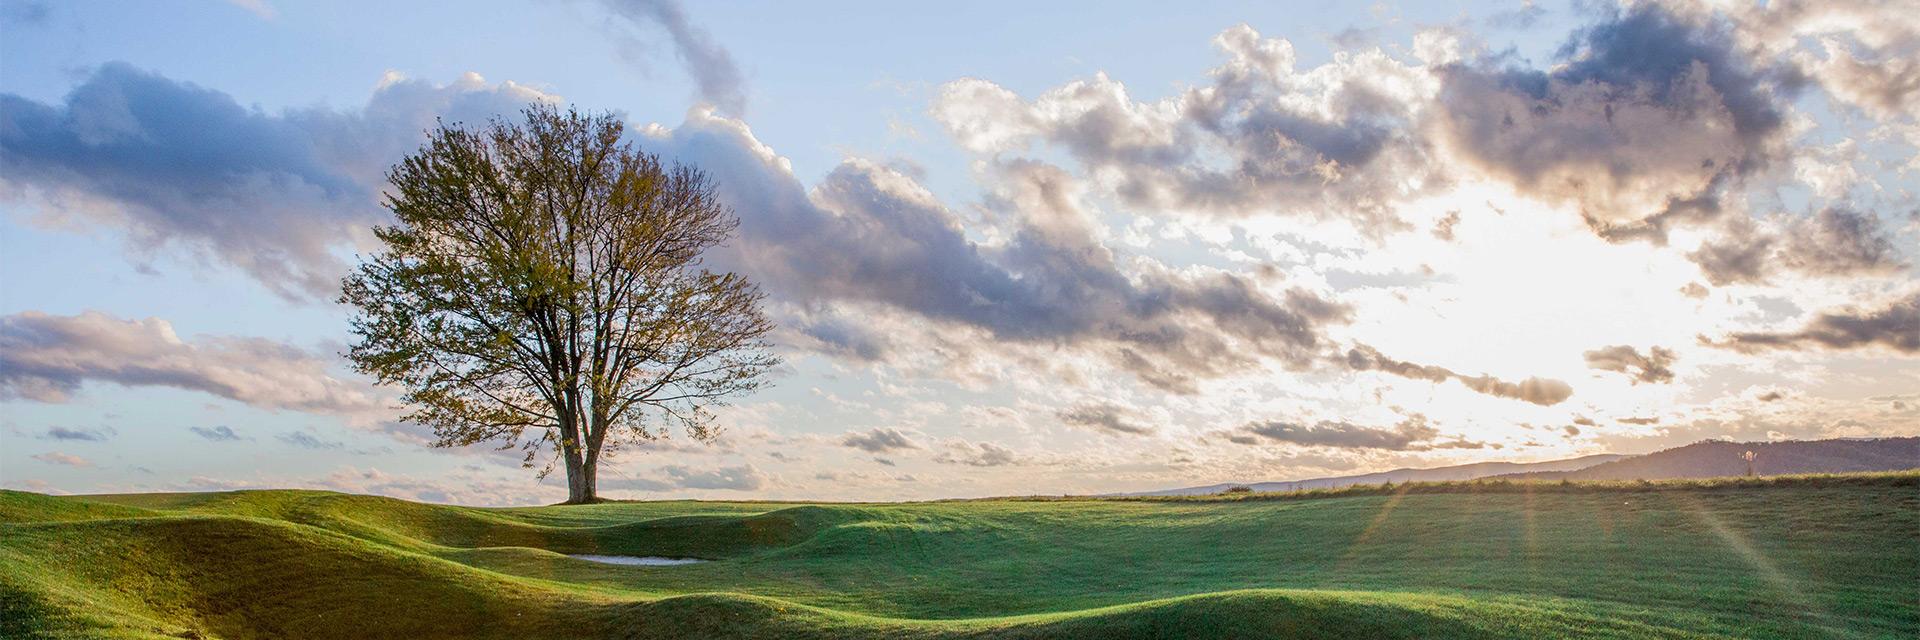 lone tree in large grassy field